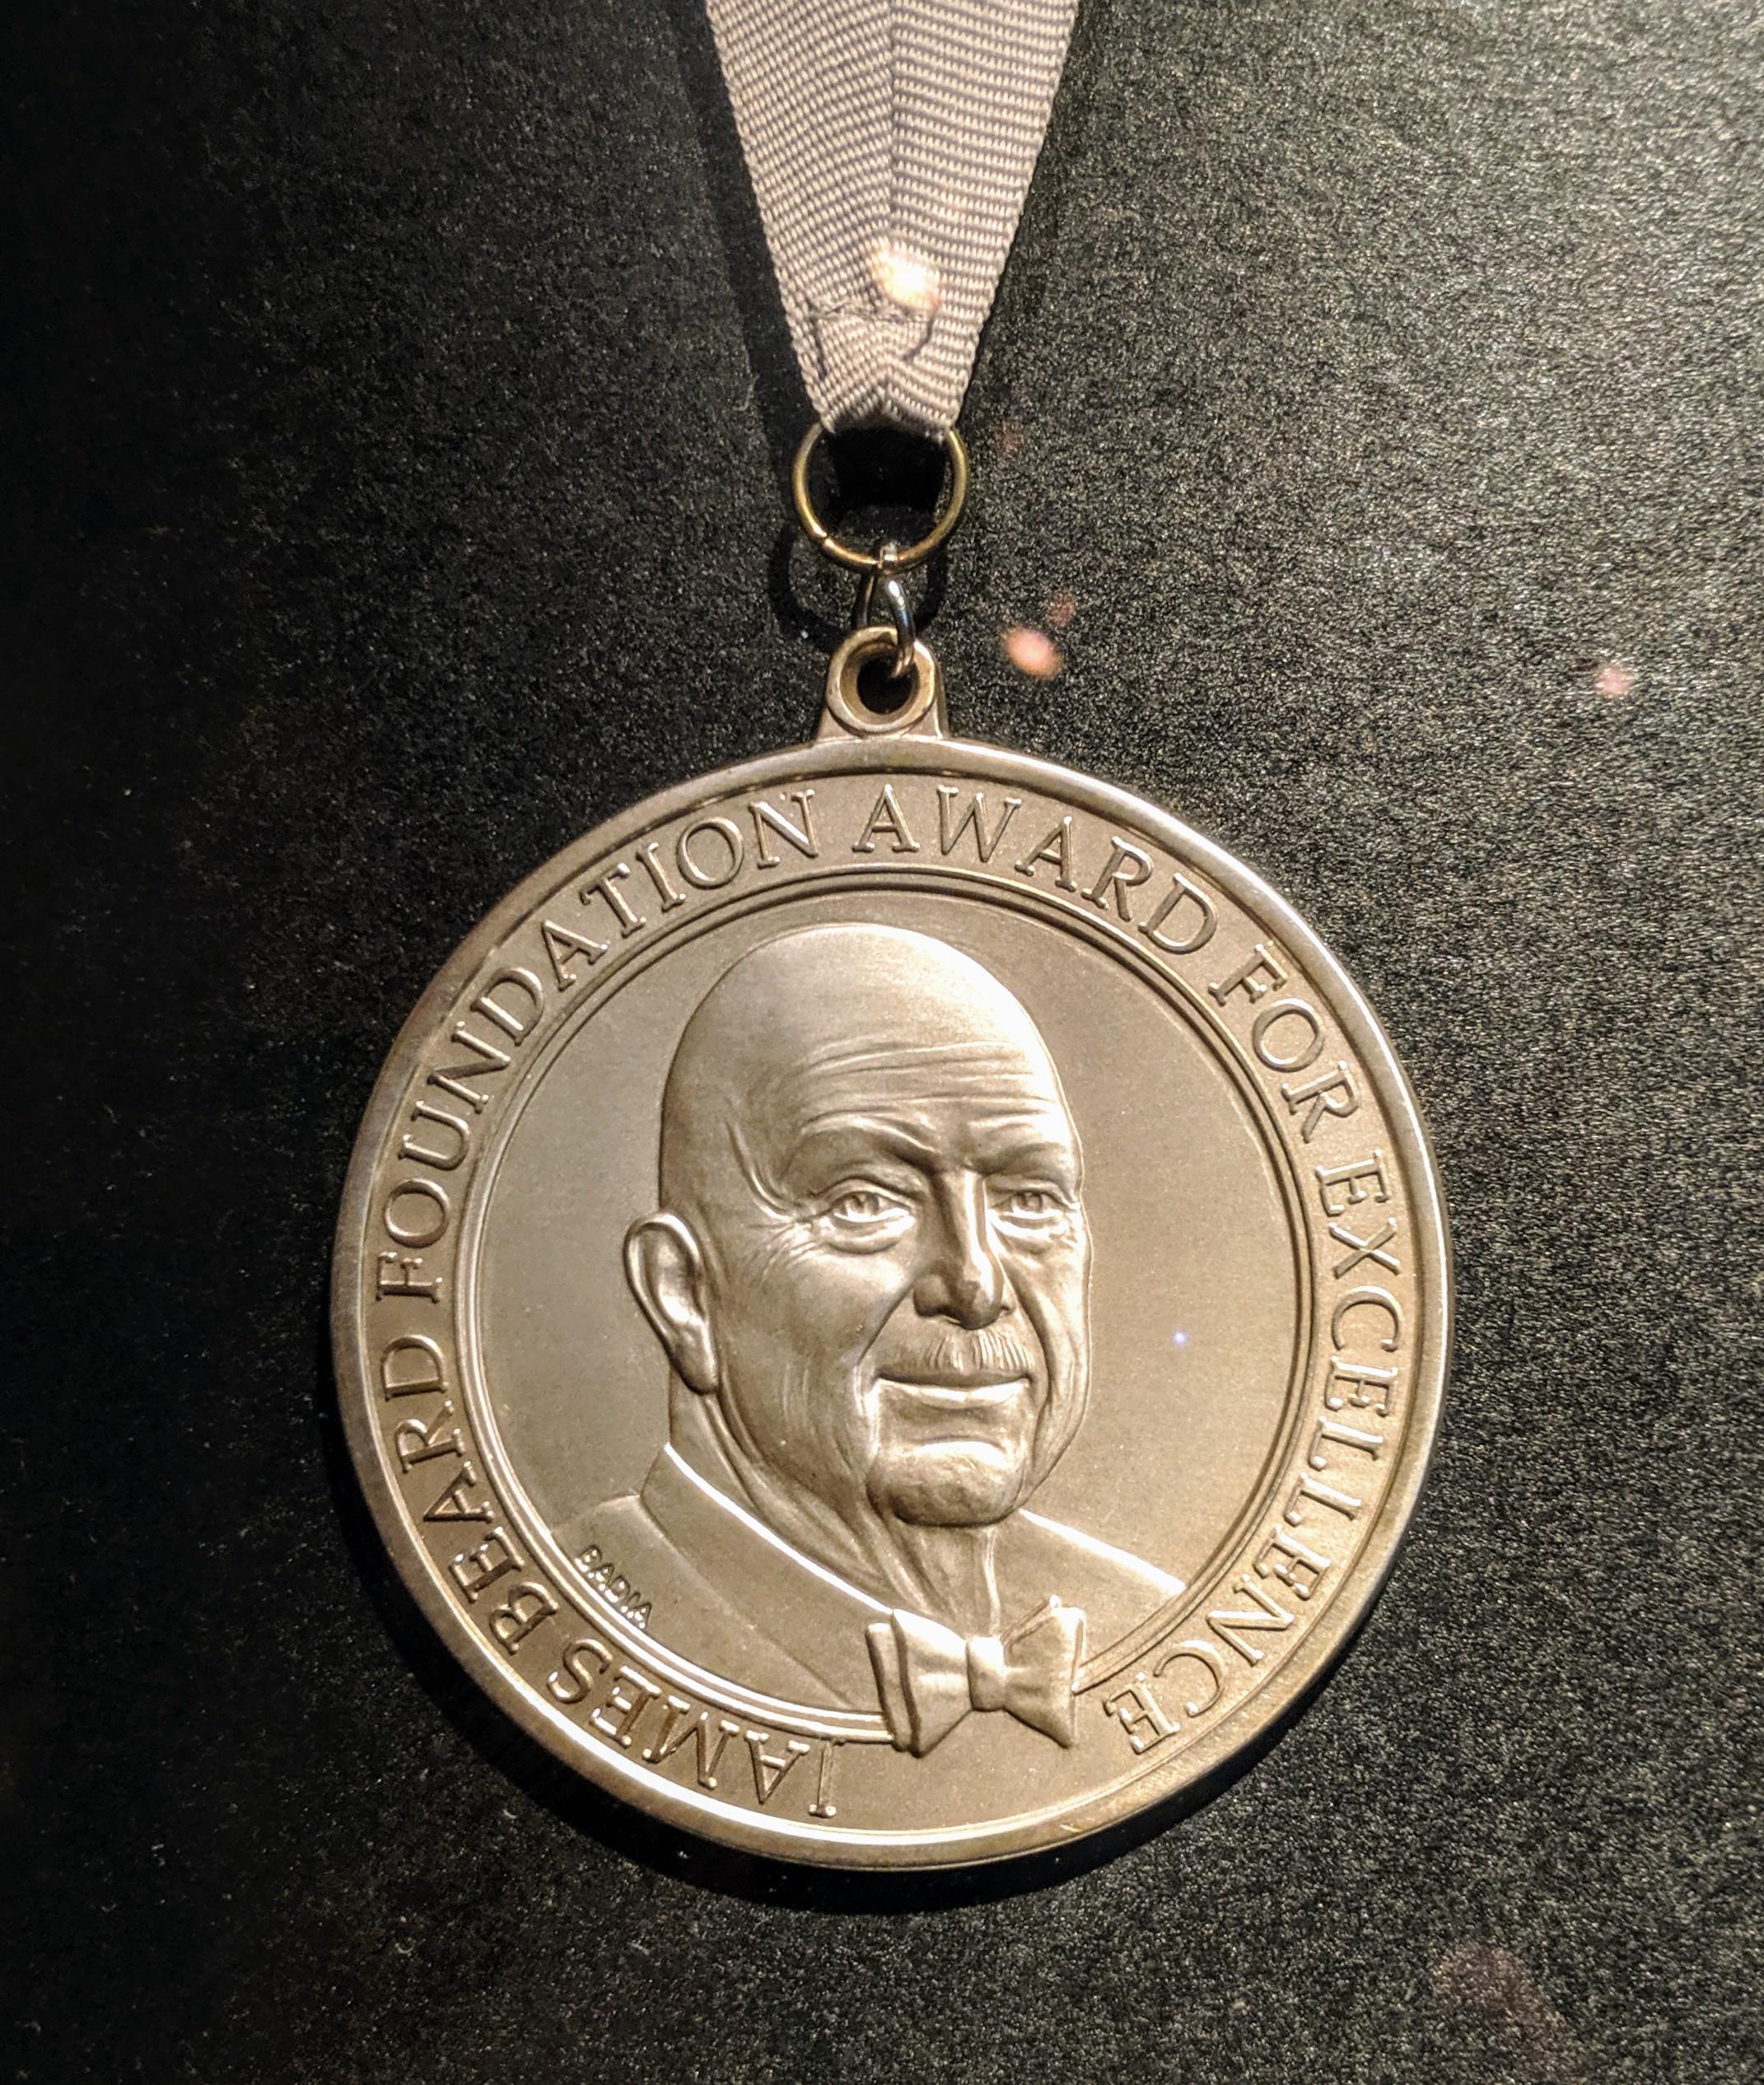 James Beard Foundation Award - Wikipedia tout Bon Coin Table De Jardin